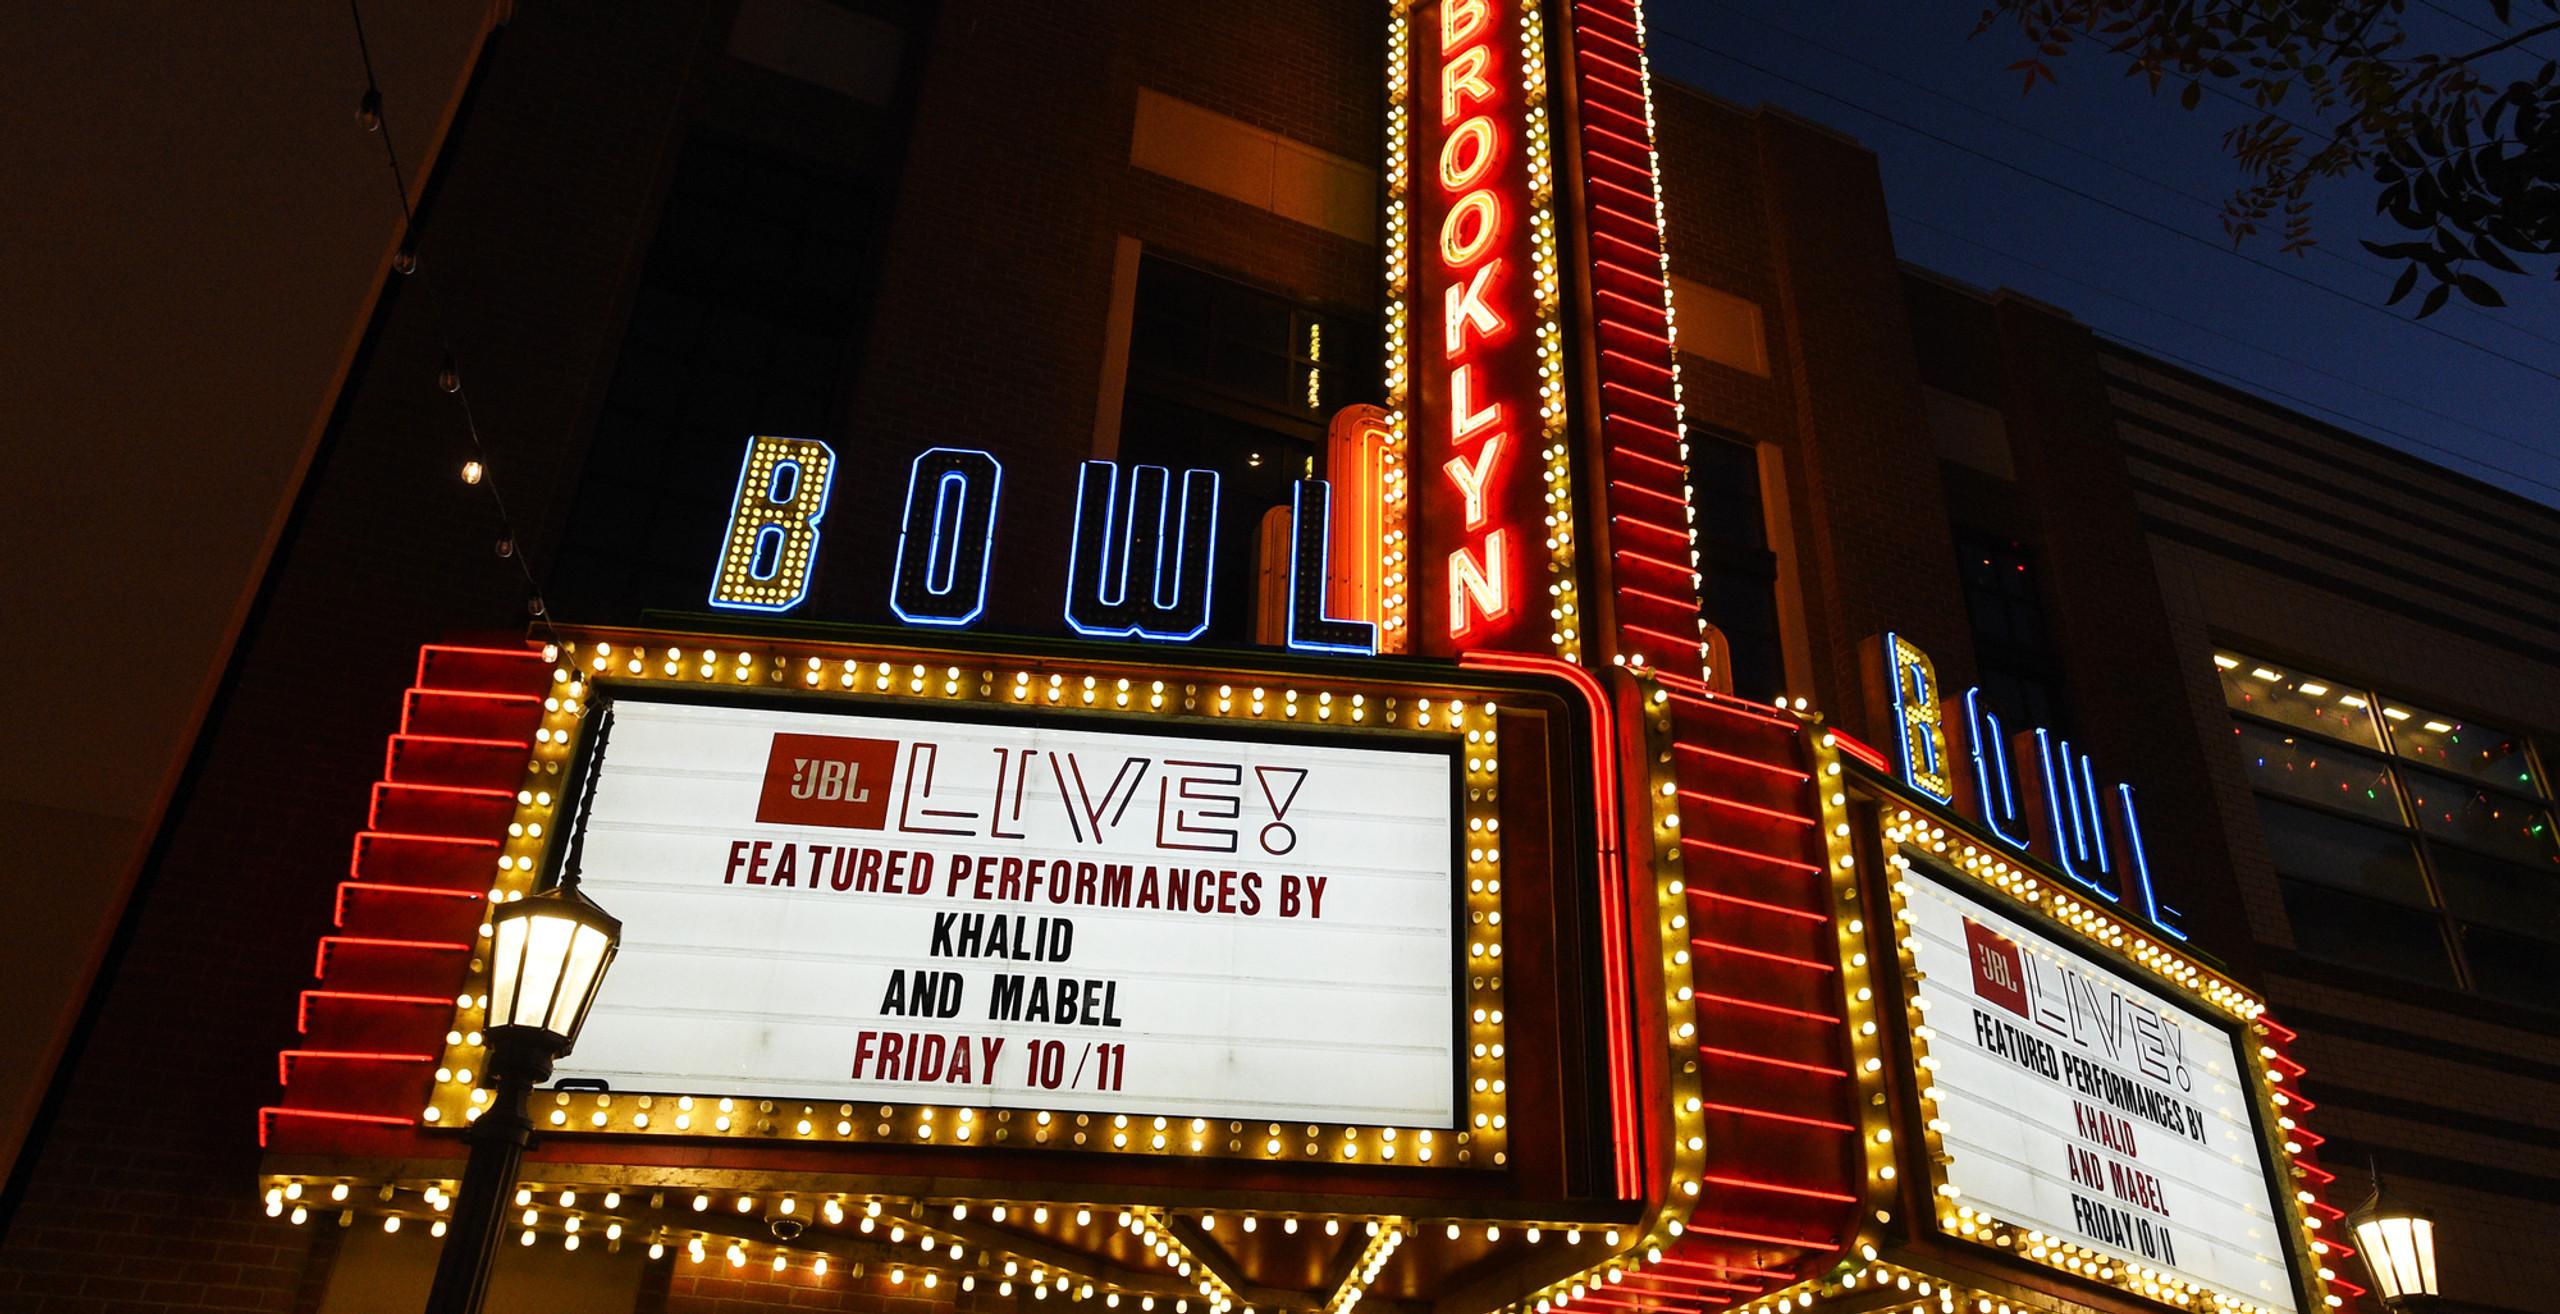 Khalid Mabel JBL Fest Brooklyn Bowl Las Vegas